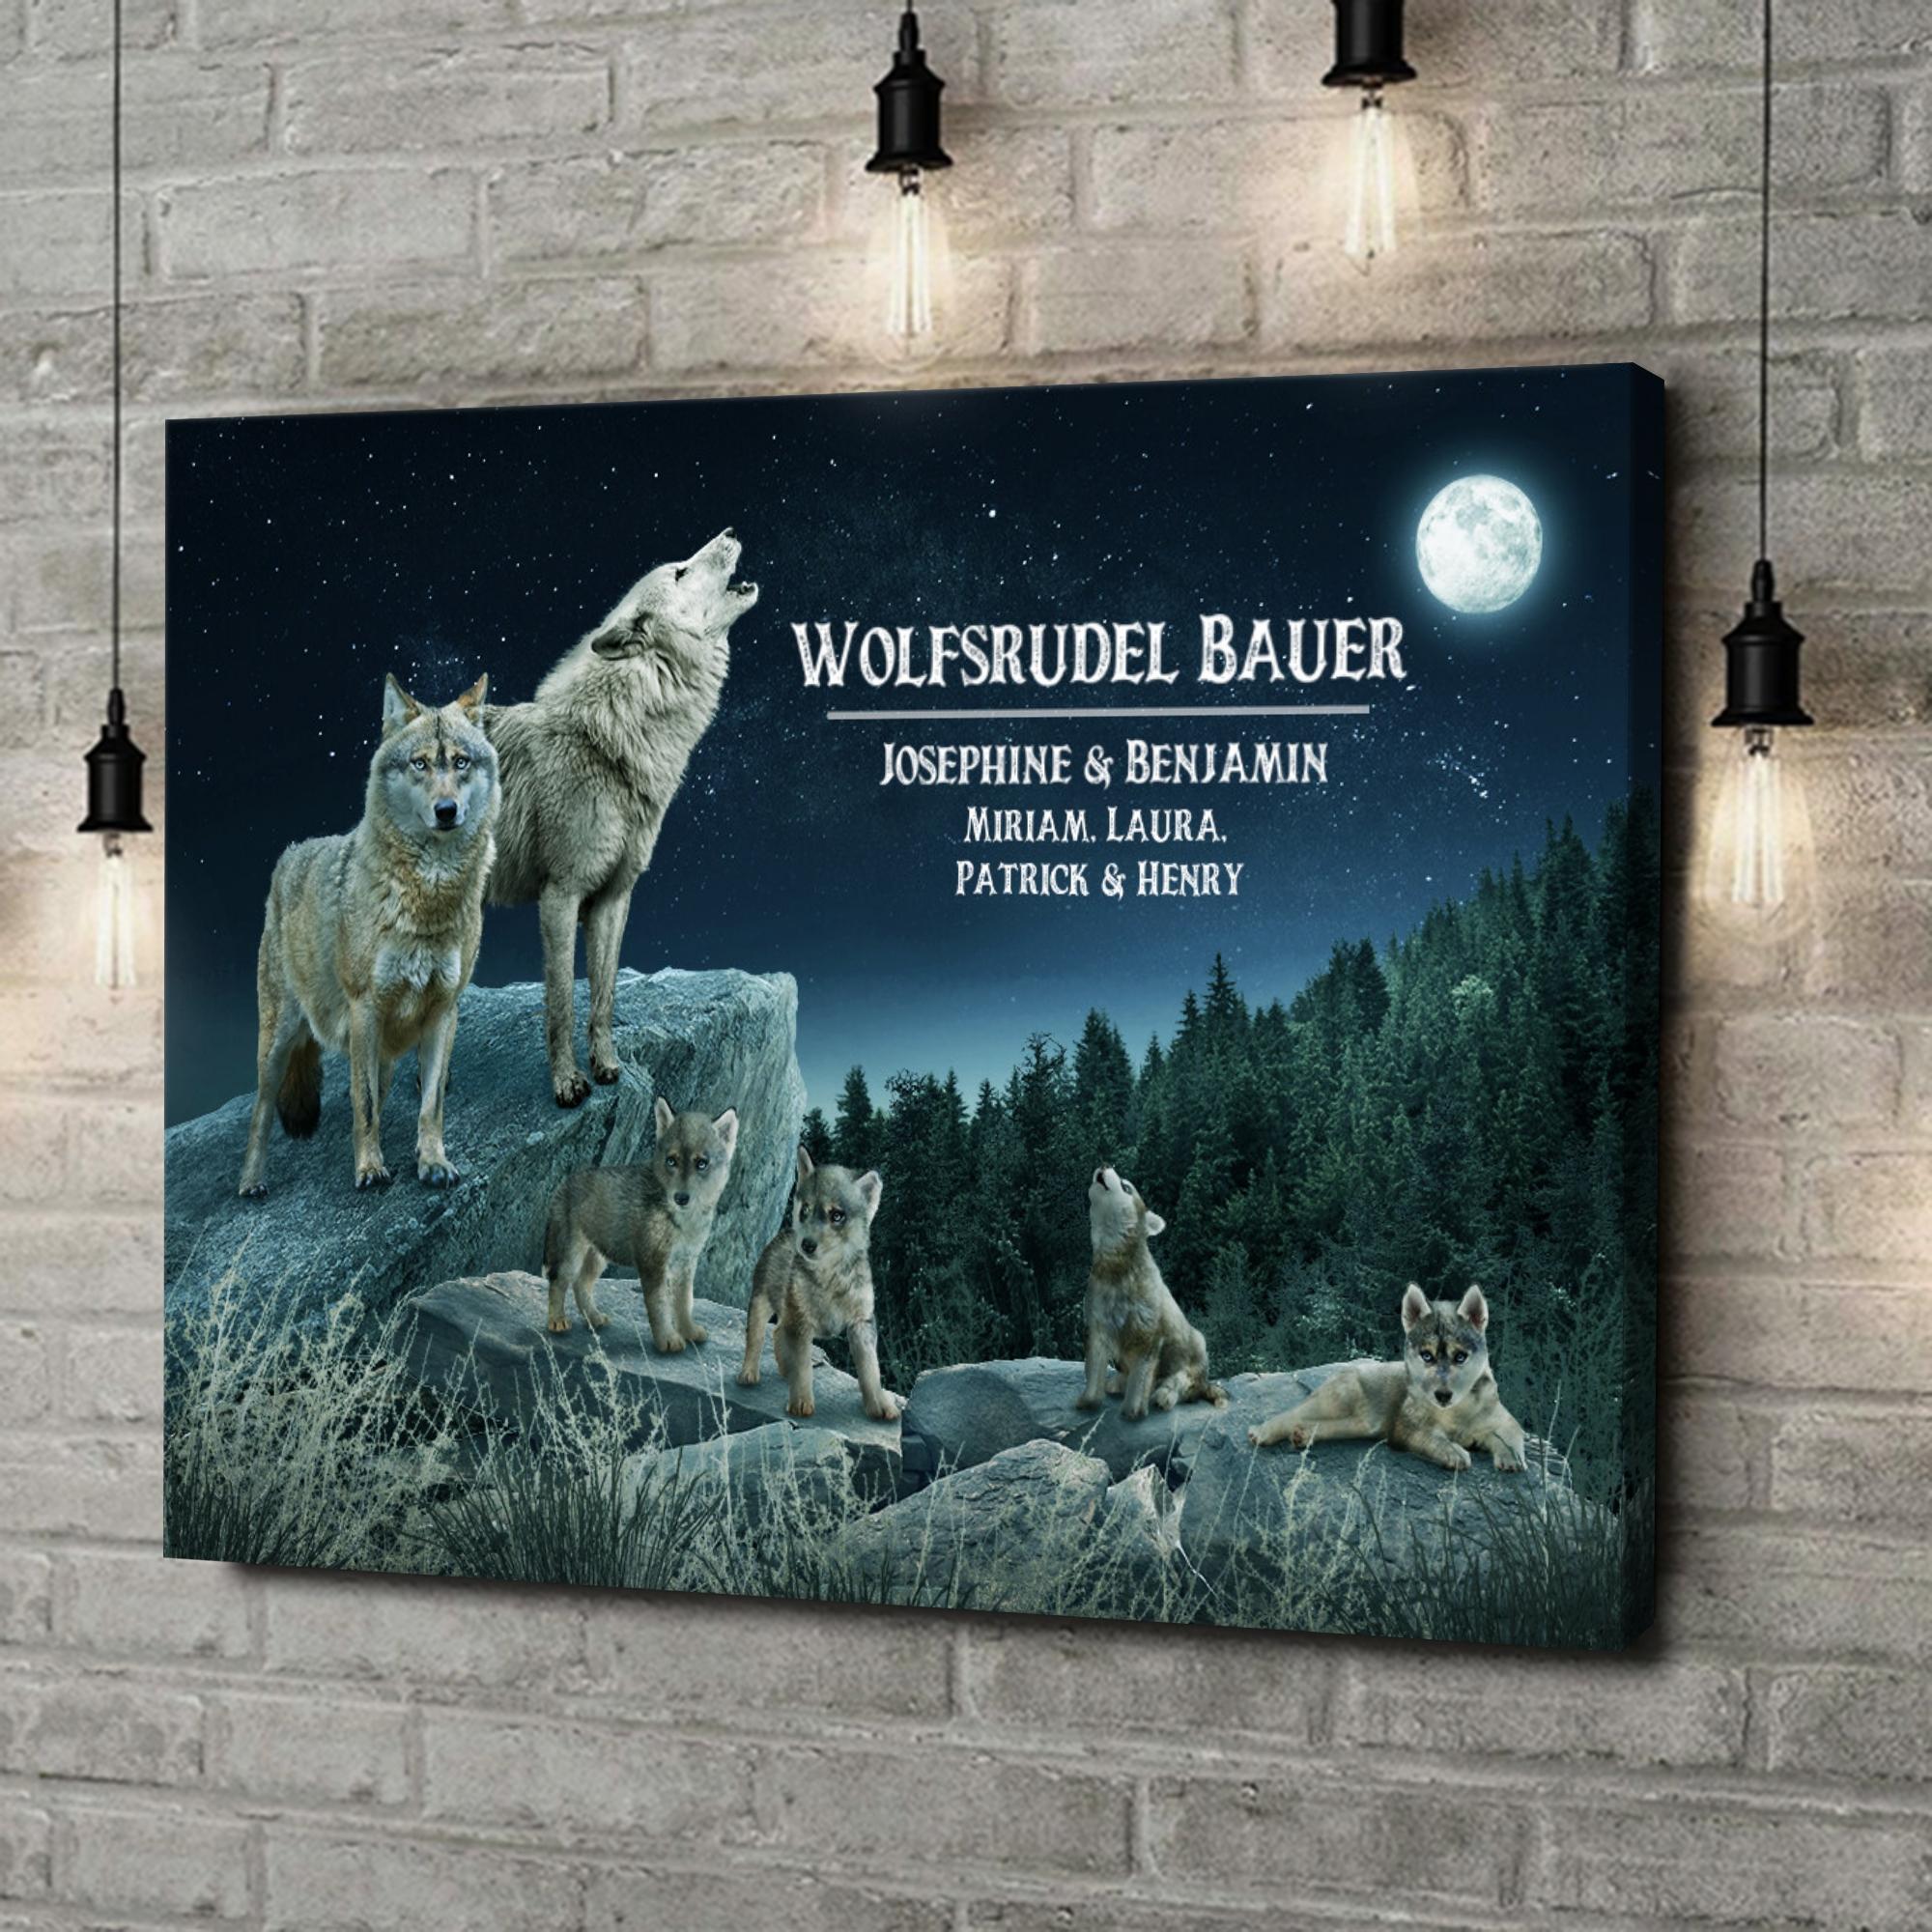 Leinwandbild personalisiert Wolfsrudel